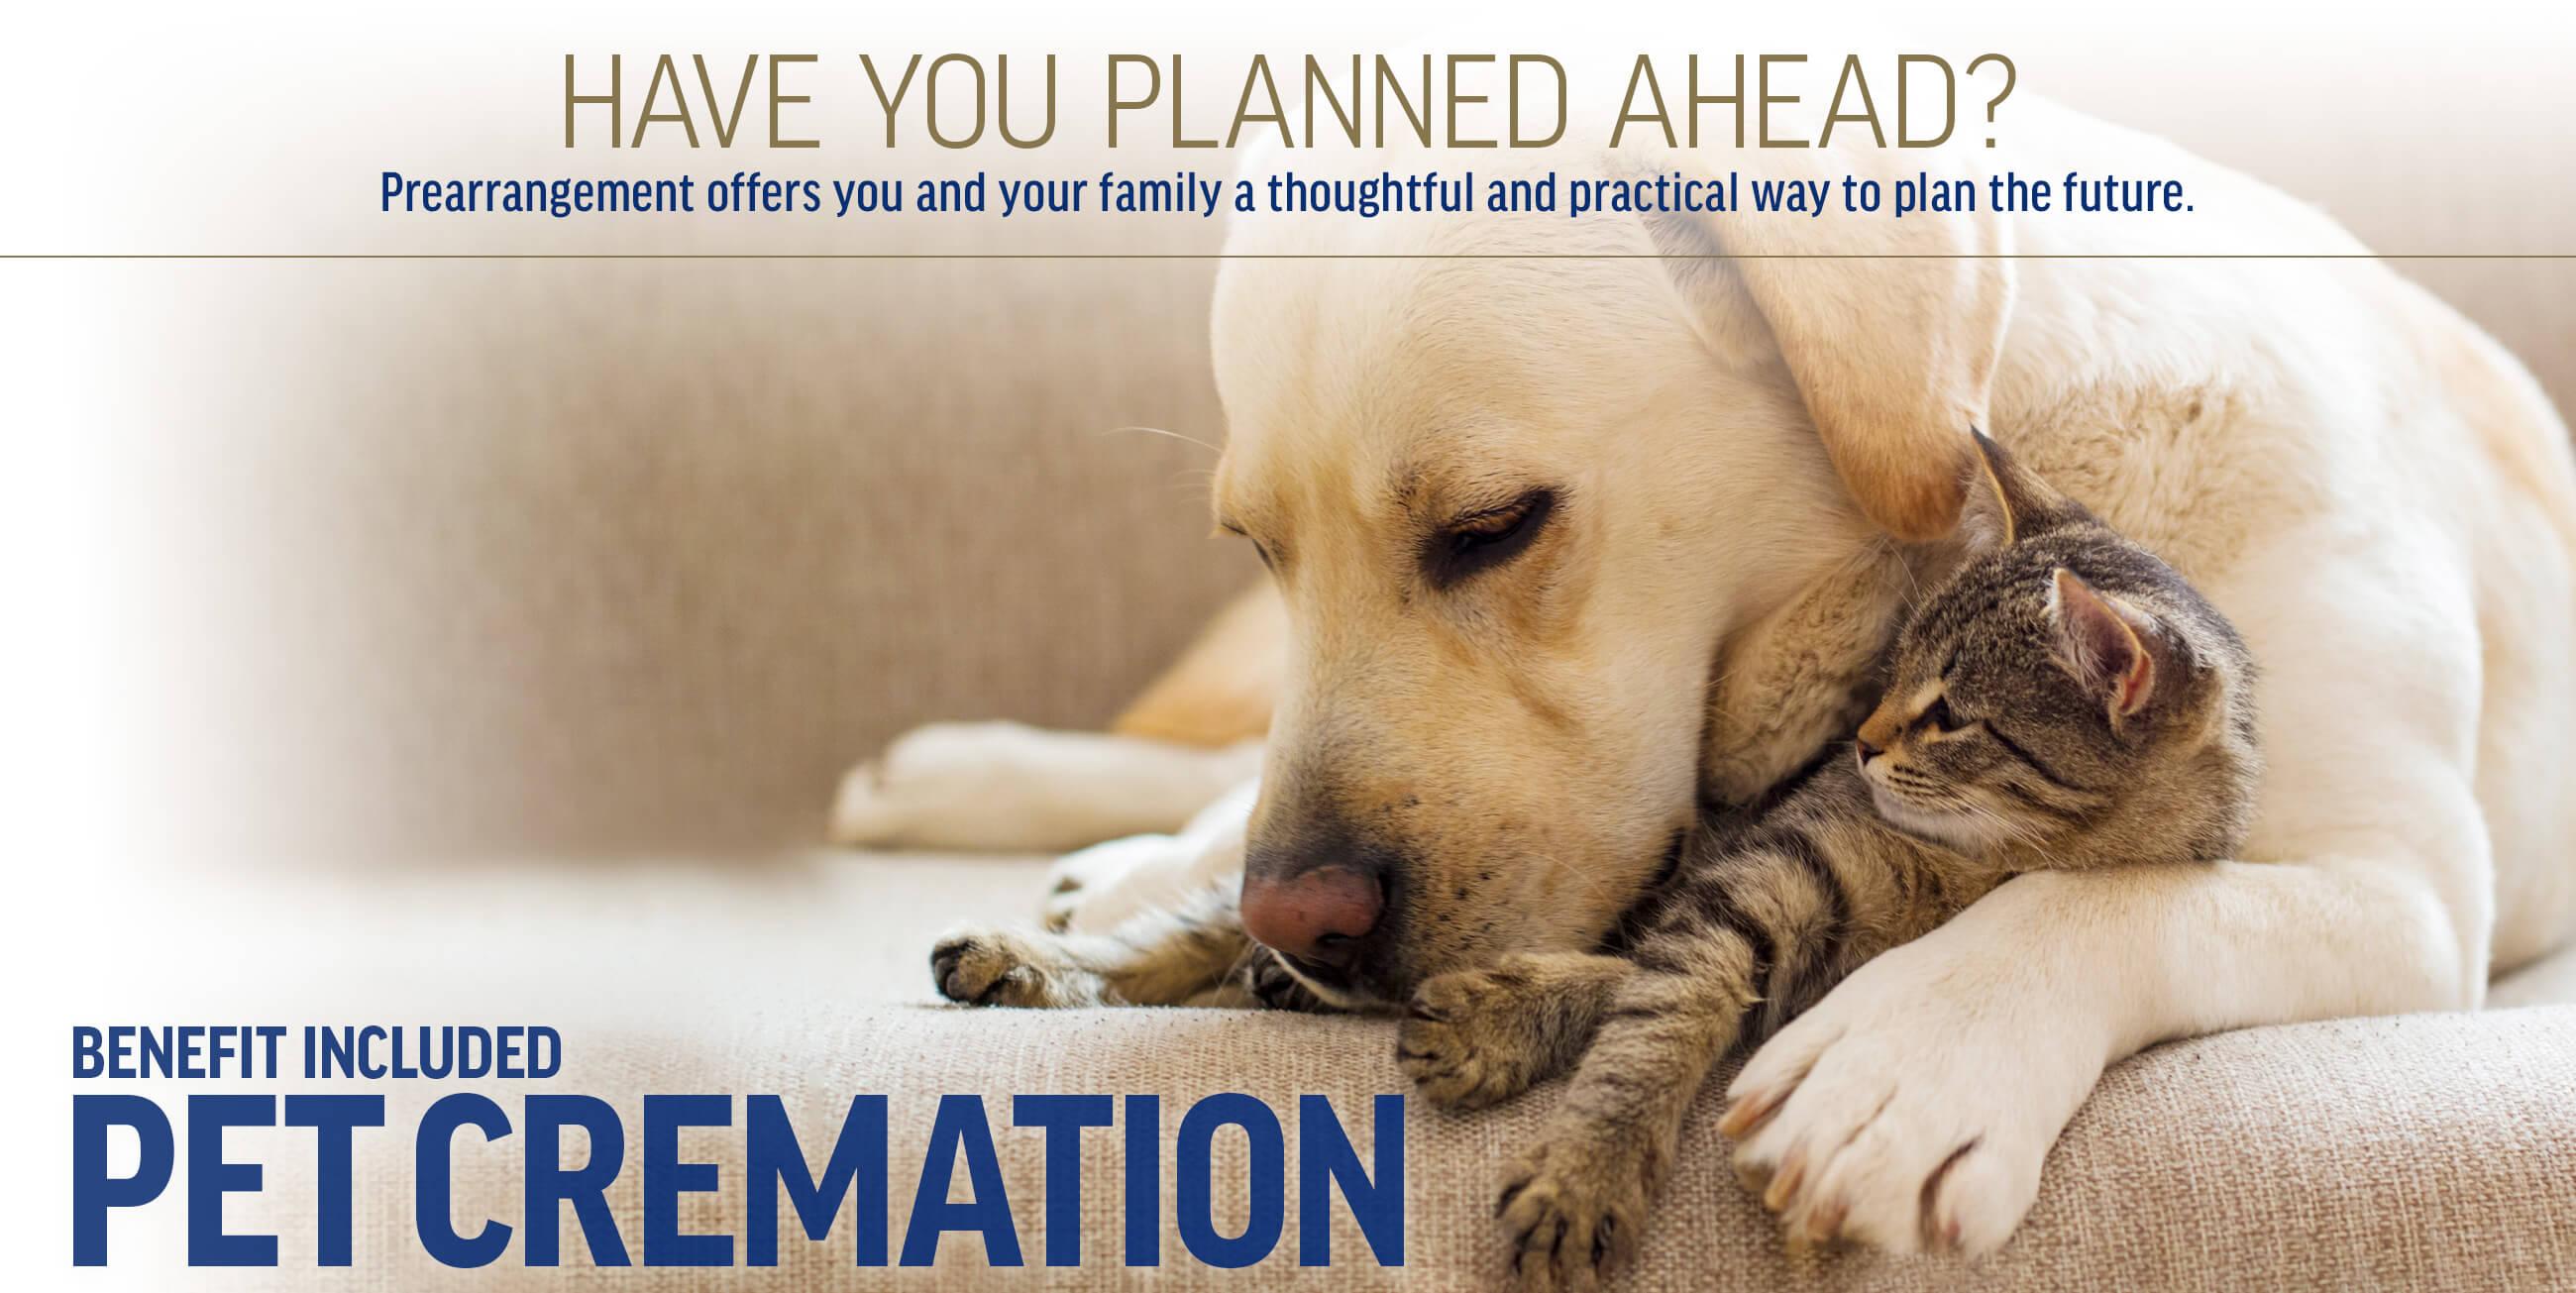 Pet Cremation Benefit